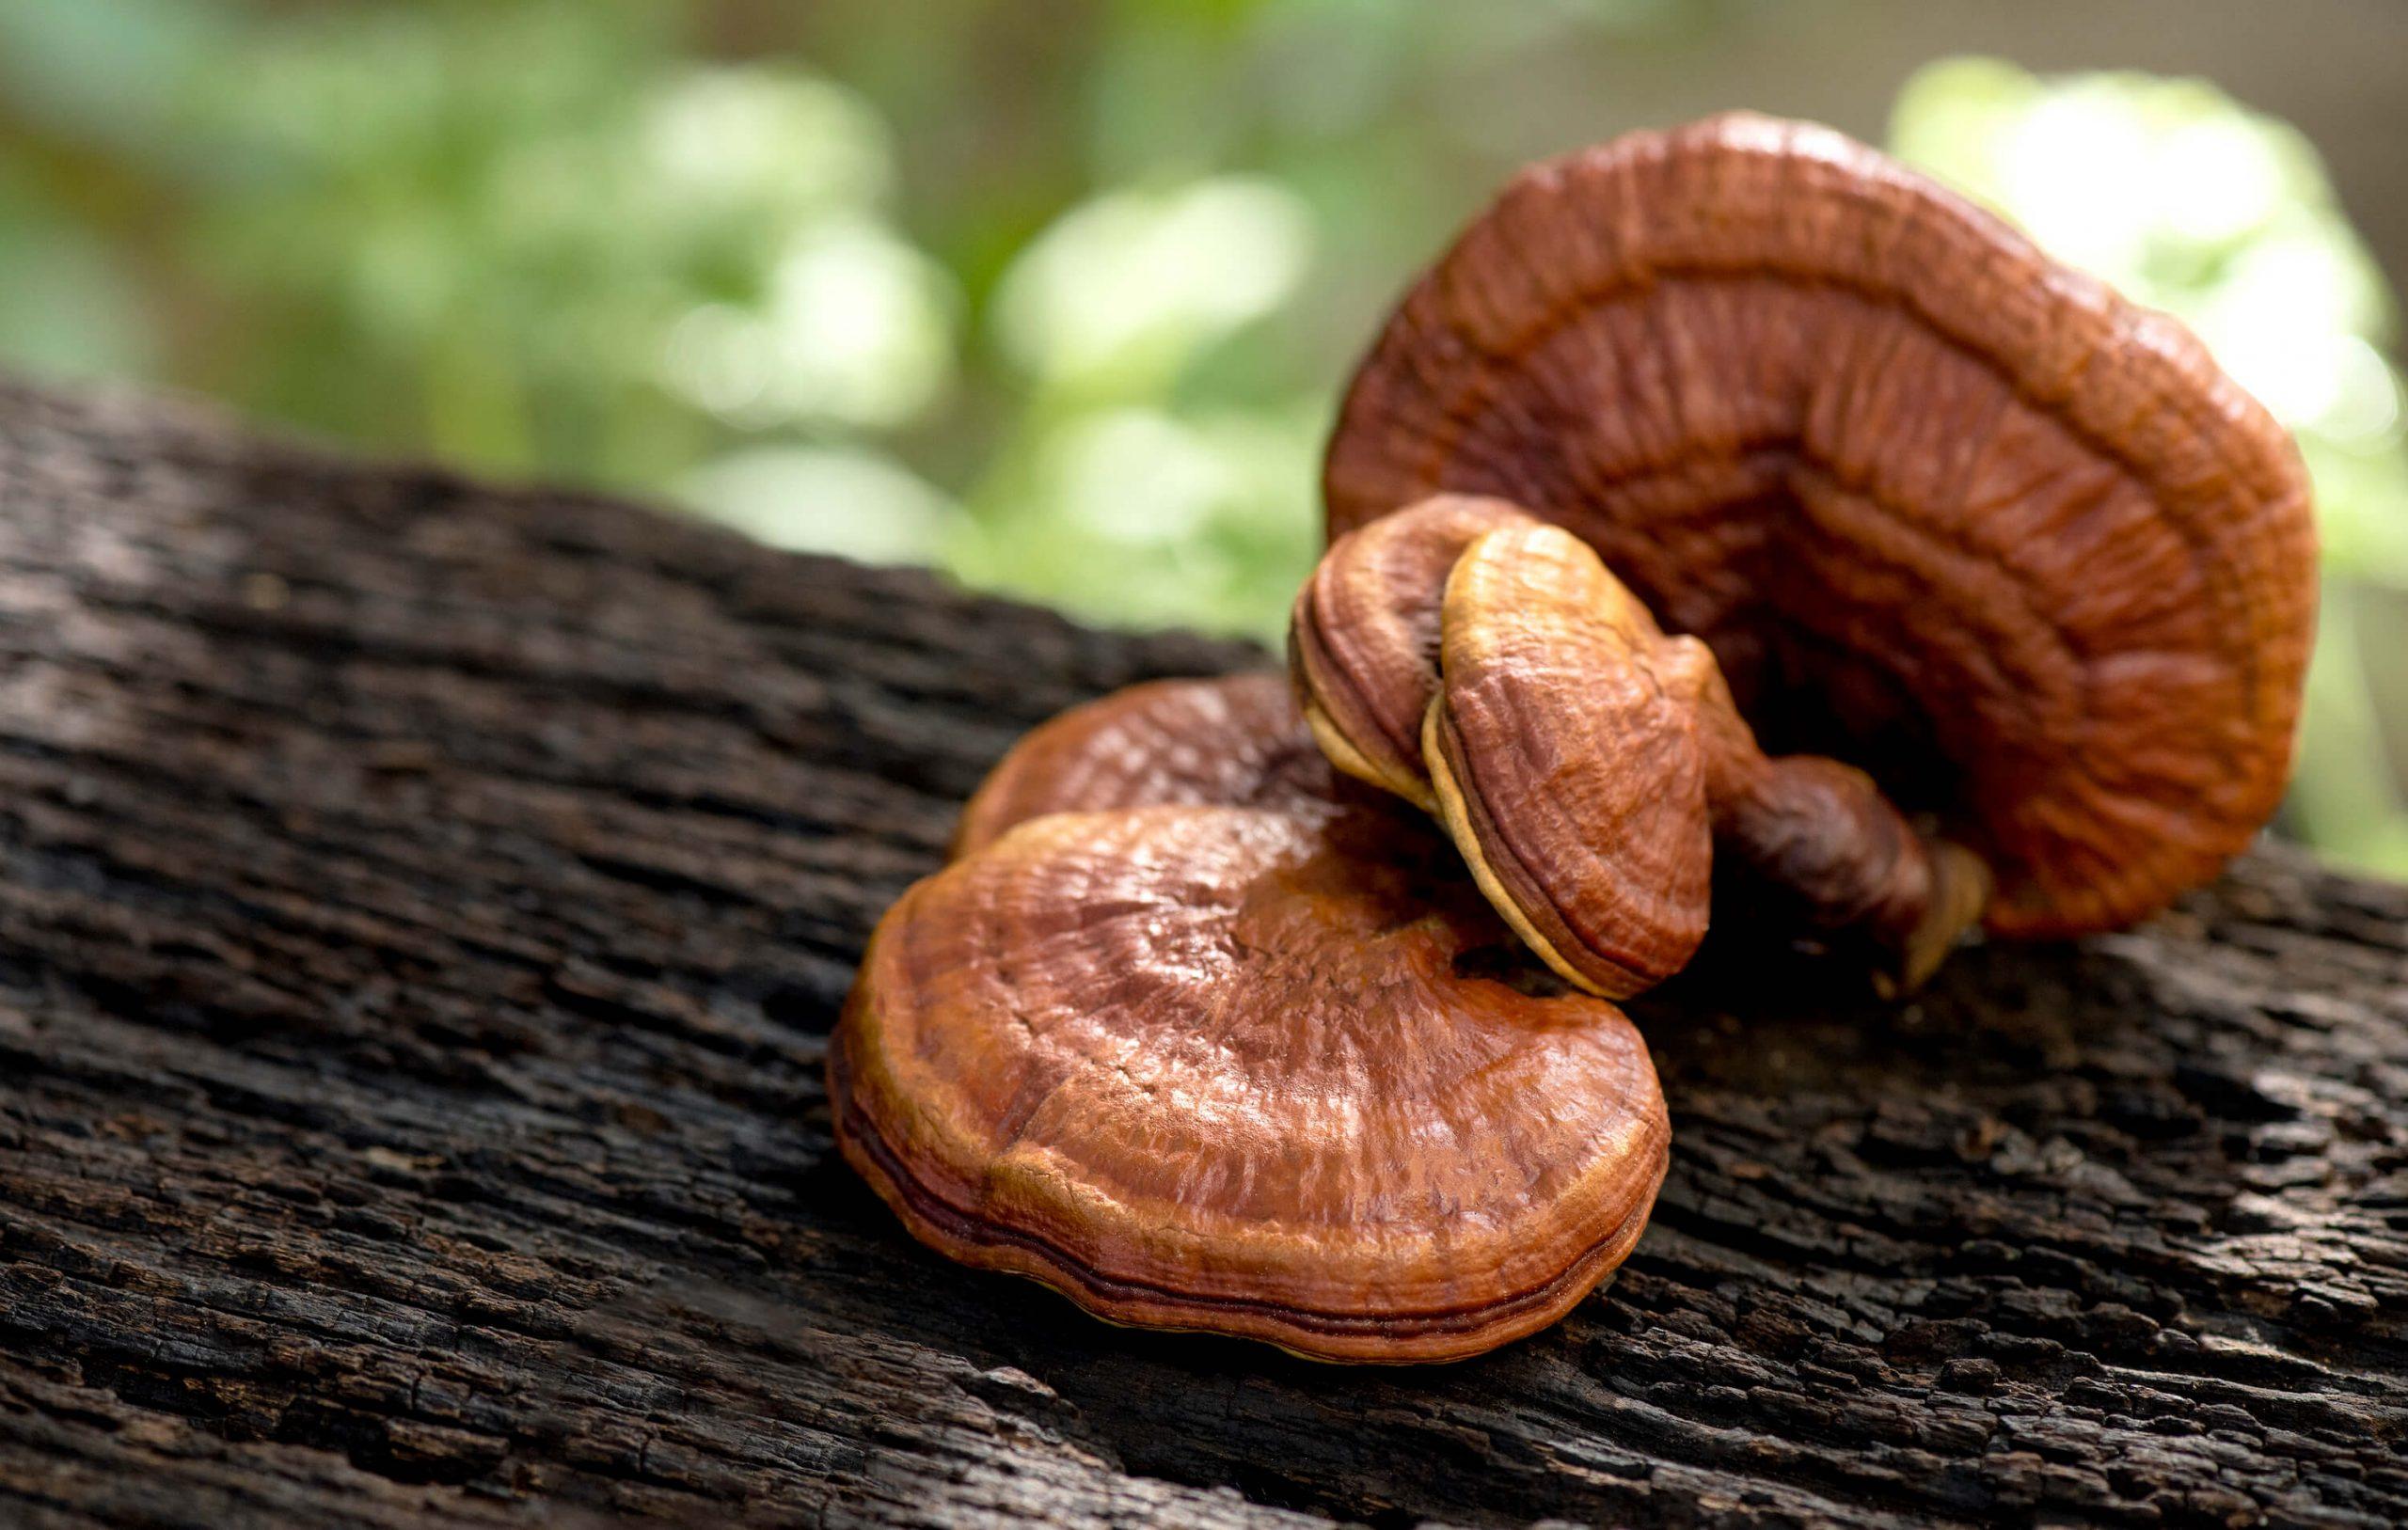 CBD and mushrooms